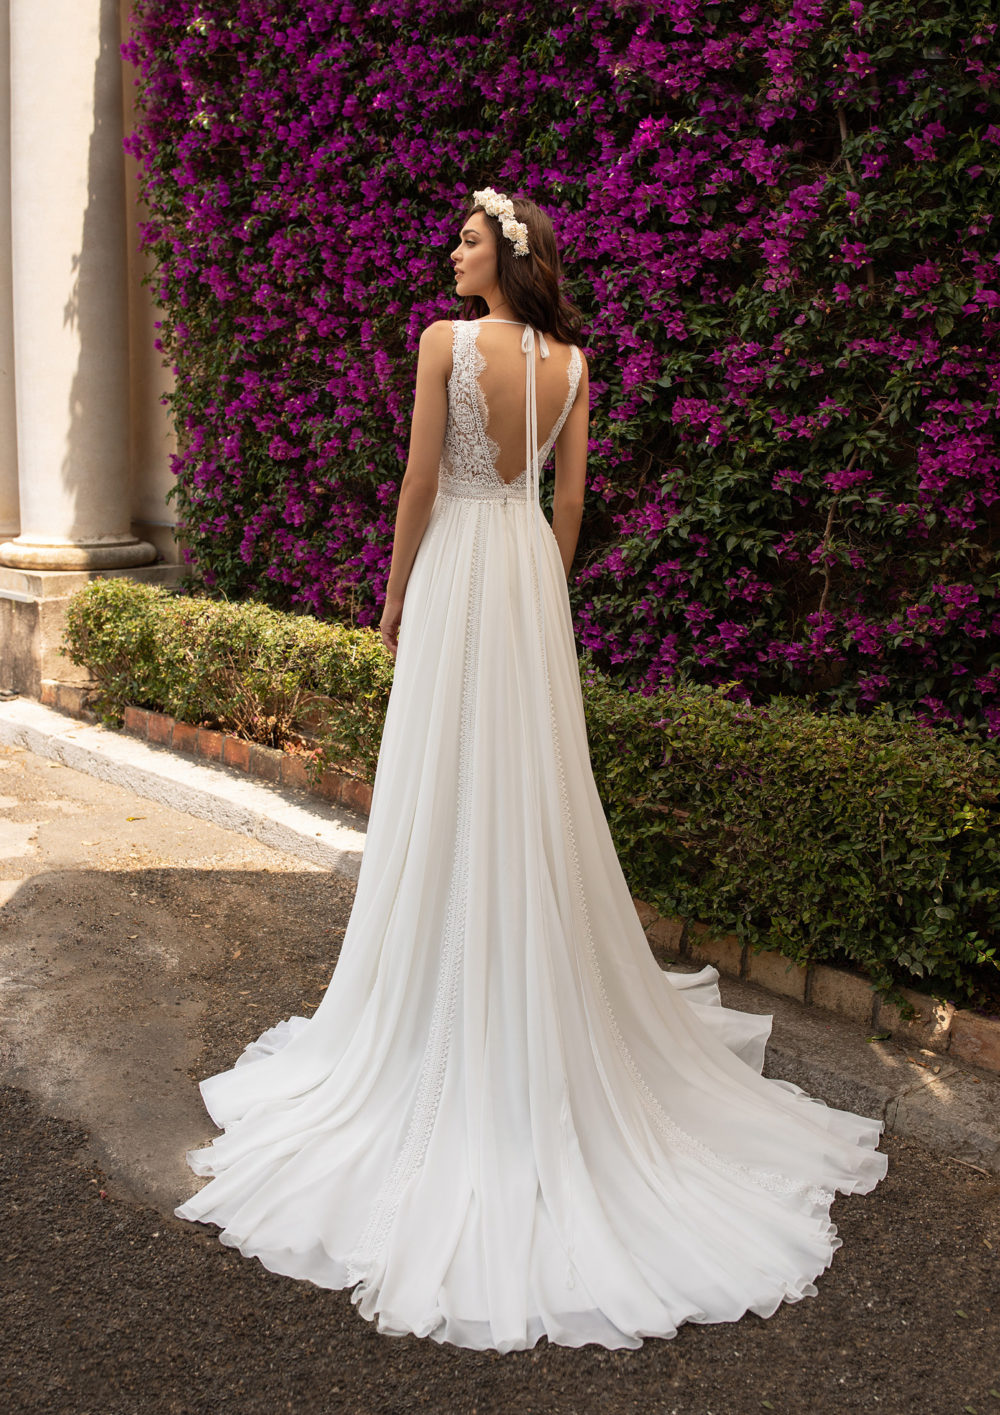 Mariages: abito da sposa Pronovias 2020 a Vicenza, Verona, Padova, Veneto EFIGIE